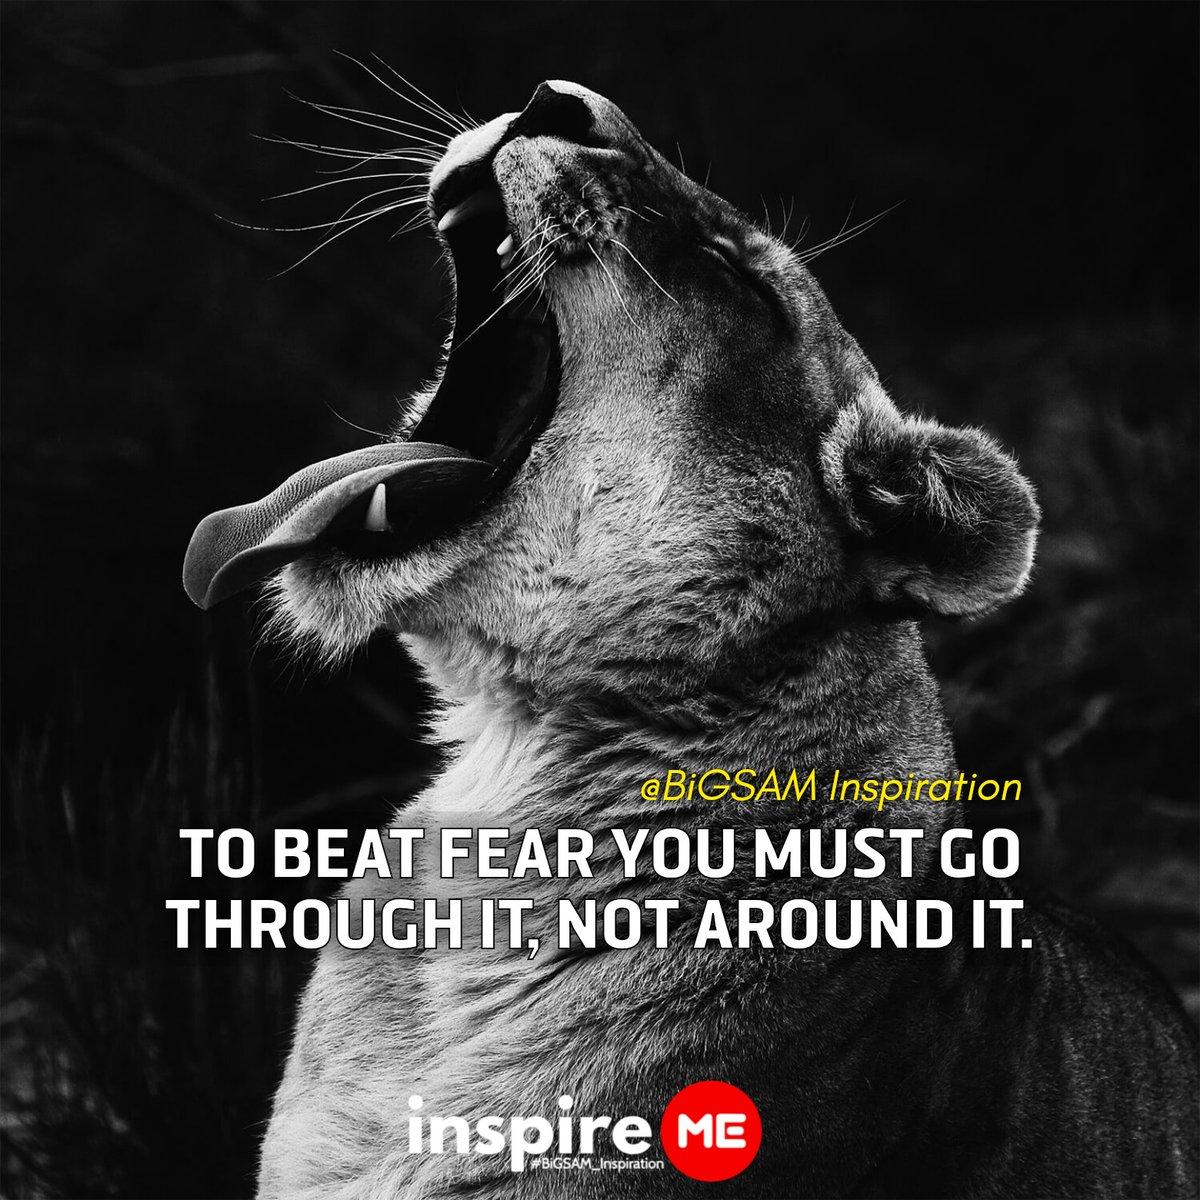 °inspireME #wisdomwednesday  #bigsam_inspiration #quote #explore #entrepreneur #encouragement #inspiration #inspireME #comment #TFLers #tweegram #quoteoftheday #transformationquotes #wisdom #life #instagood #writersofinstagram #igers #instagramhub #wordsofwisdom #instadaily #true